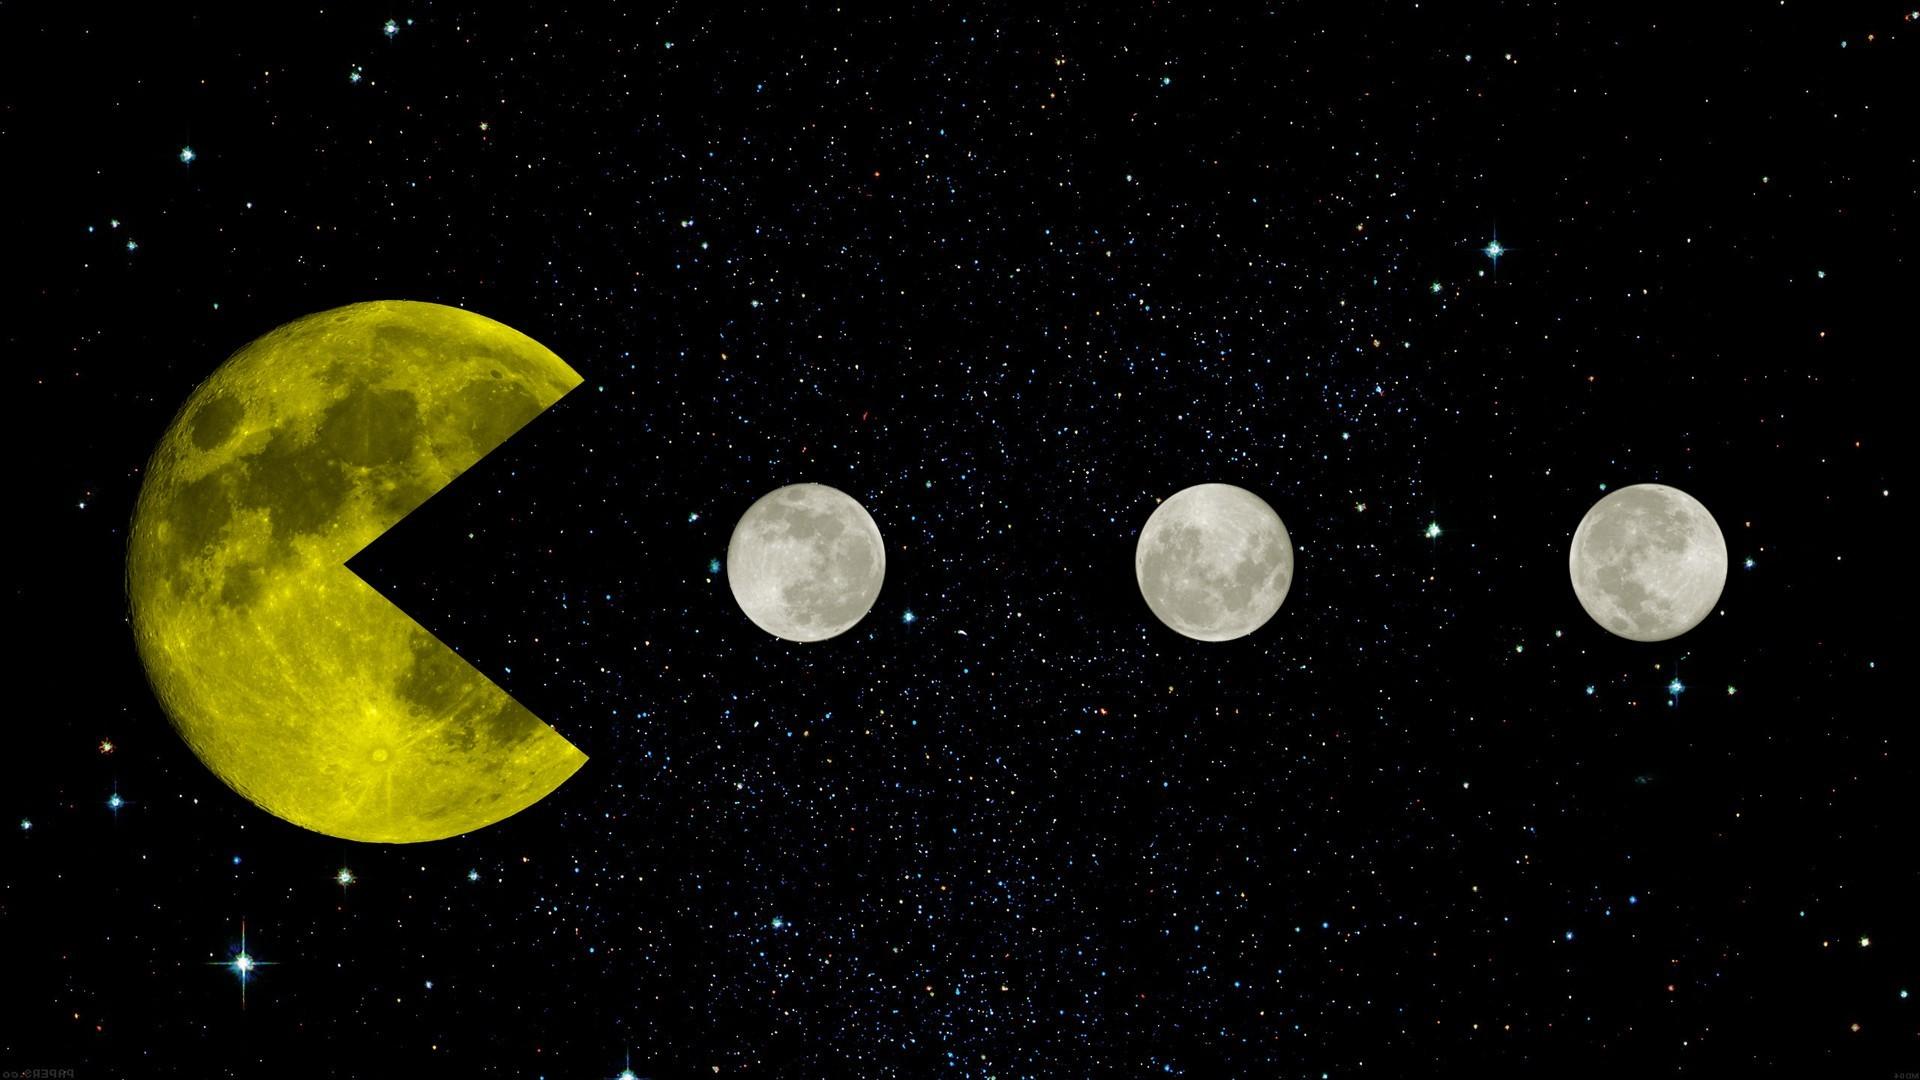 Pac Man, Yellow, Space, Moon, Moon, Stars, Black, Retro